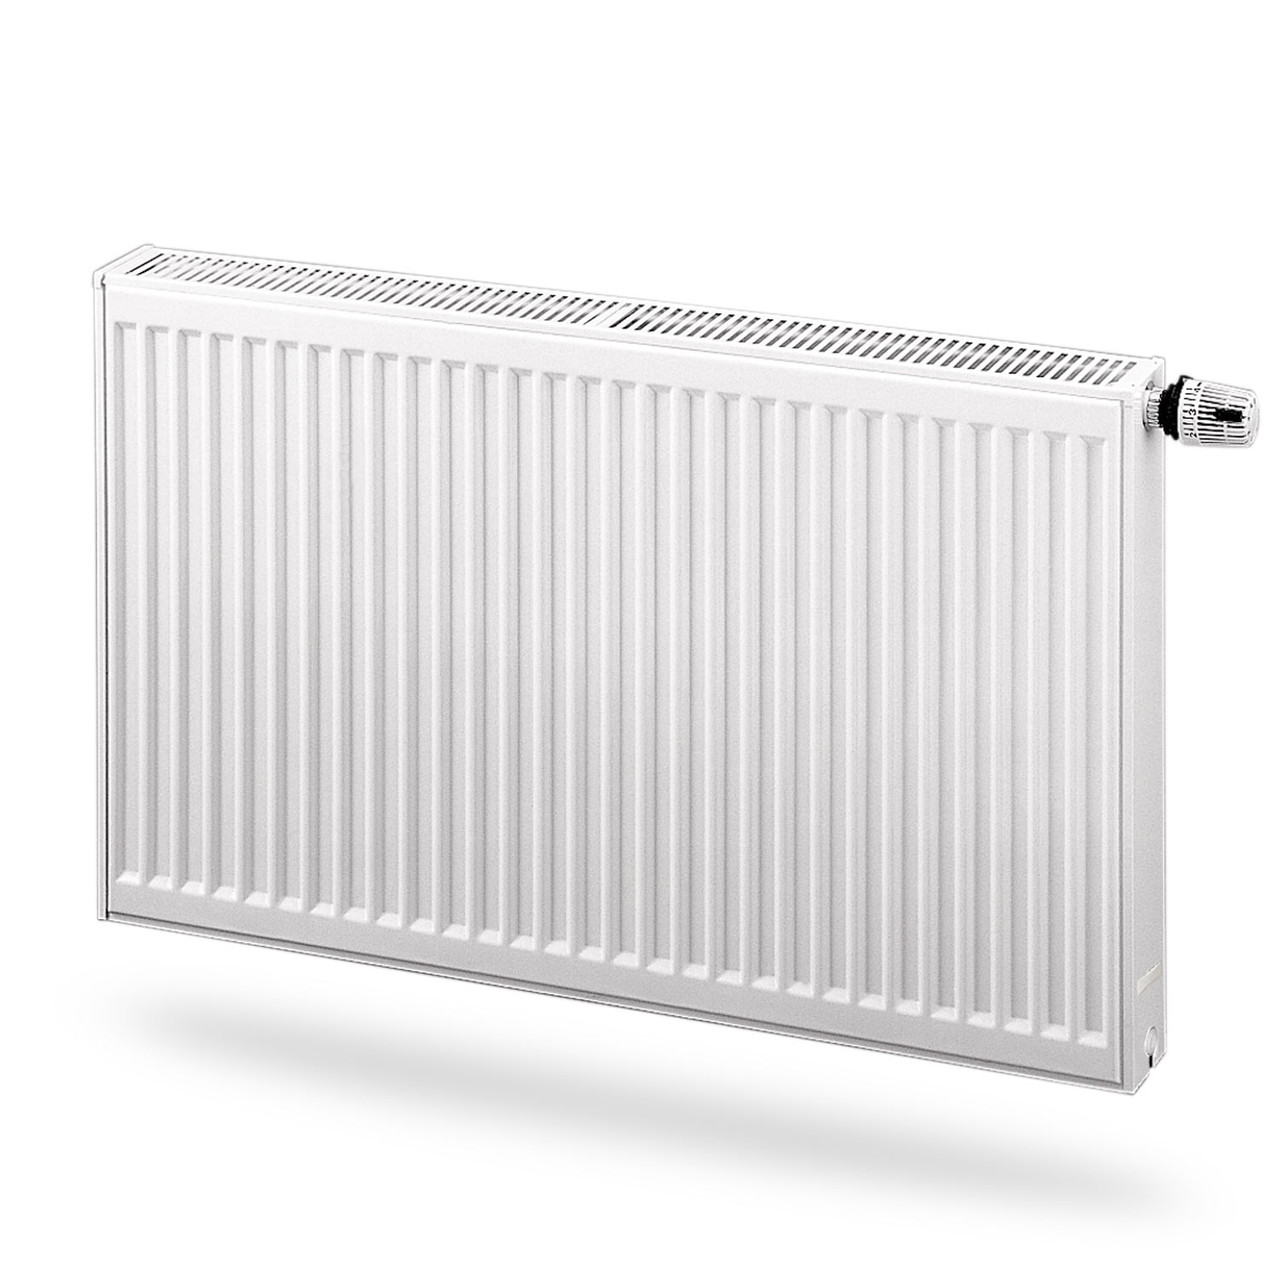 Стальные радиаторы PURMO Ventil Compact 33 500х1000